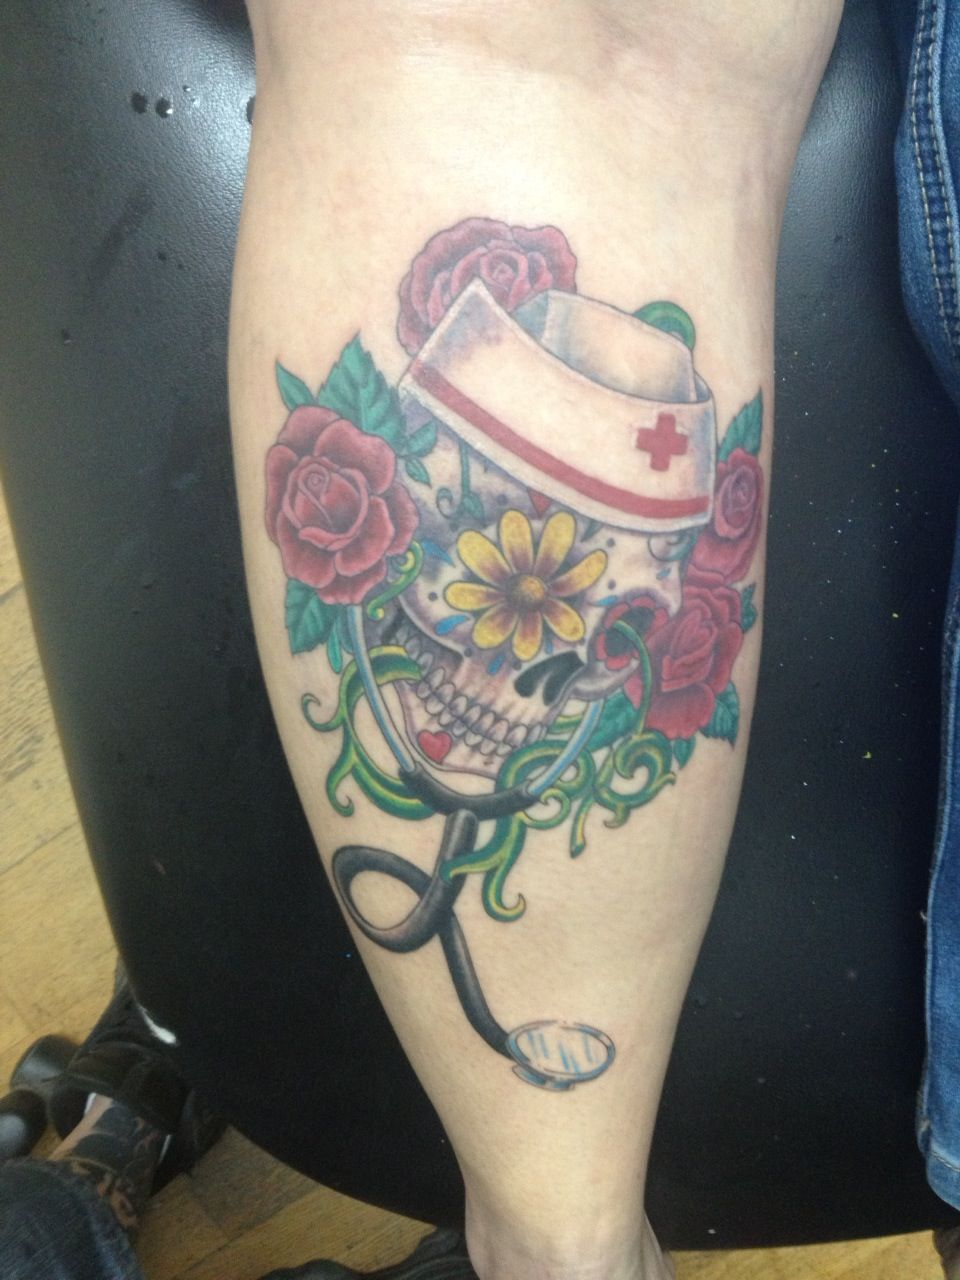 Tattoos tattoo ideas on pinterest rn - My Sugar Skull Nurse I Love It Hurt Like Hell Tattoo Designstattoo Ideasnursing Tattoossleeve